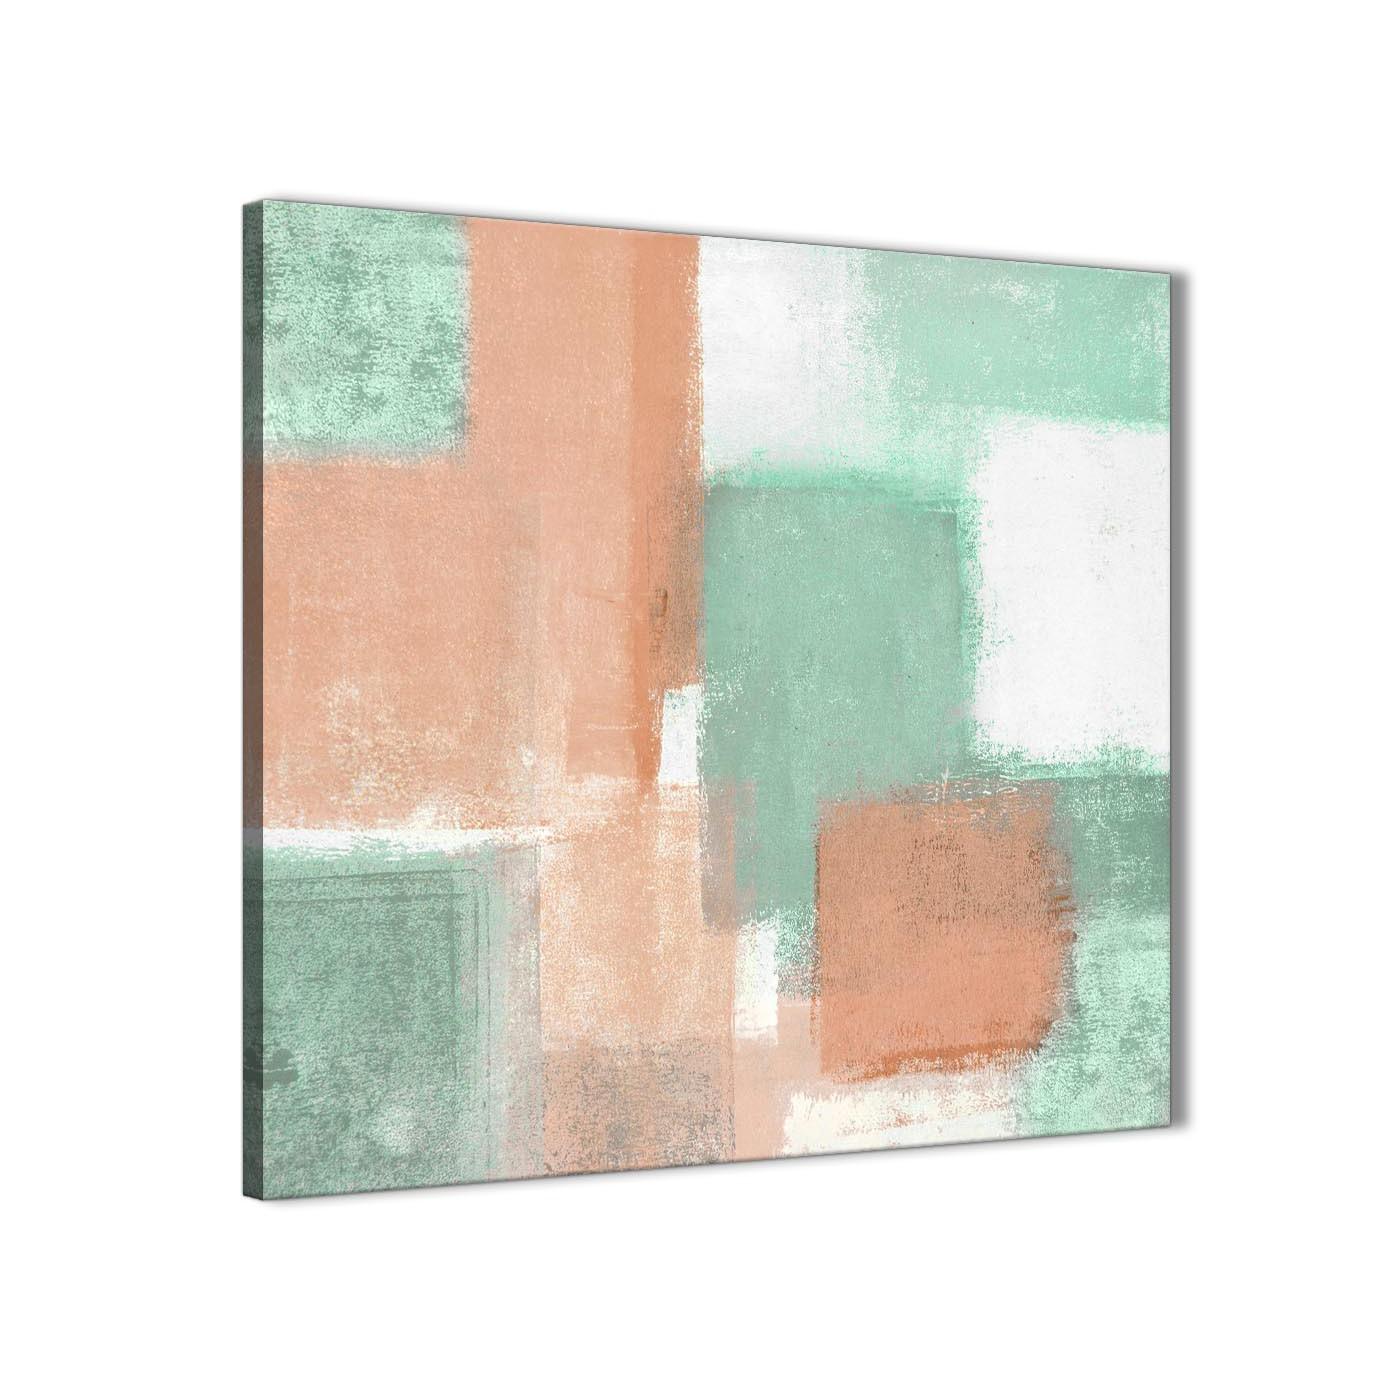 Peach Mint Green Bathroom Canvas Wall Art Accessories Abstract 1s375s 49cm Square Print